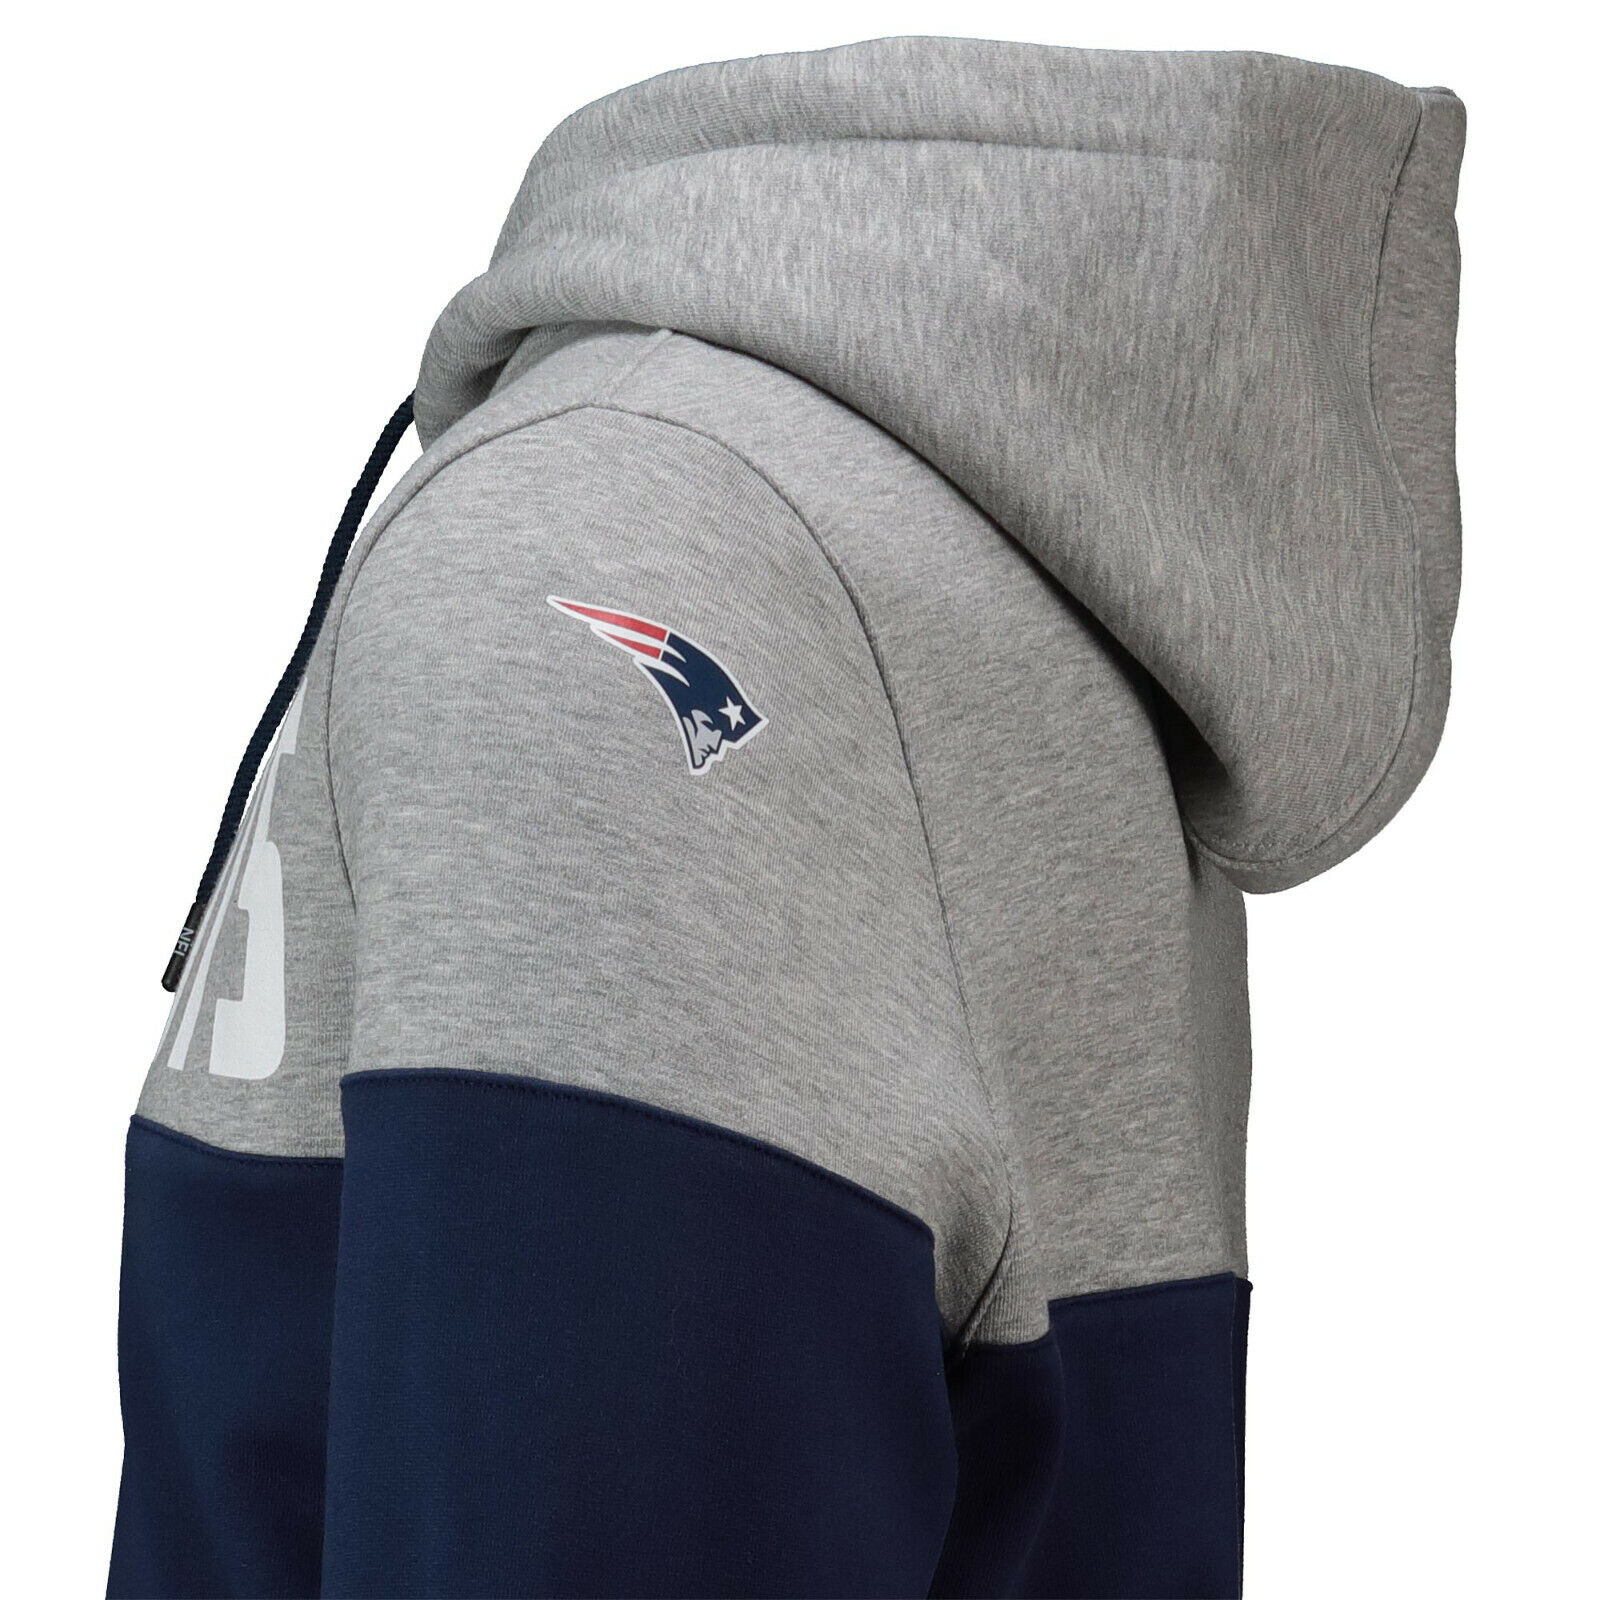 NFL Hoody New England Patriots Hoody Hoody Hoody Cut and Sew Hooded Sweater Kaputzenpullover 8dd8ca